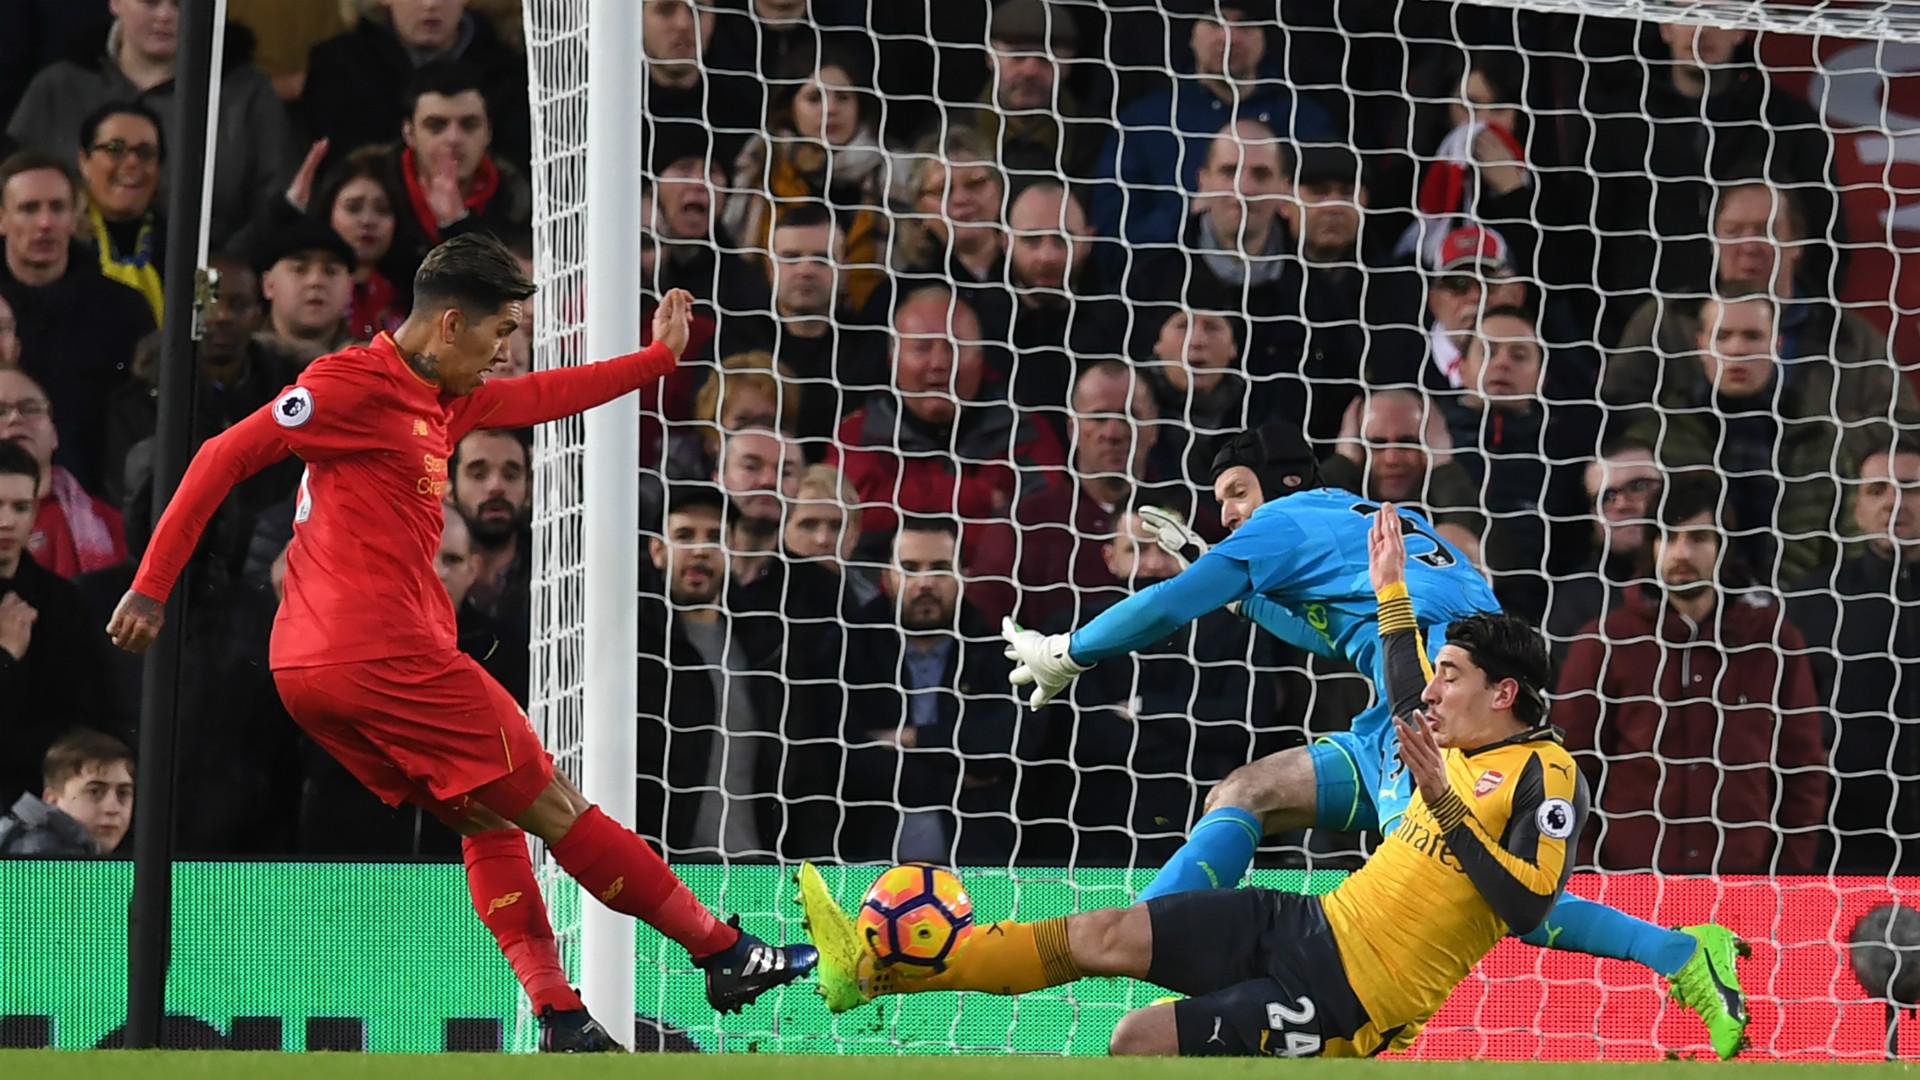 HD Firmino goal Liverpool v Arsenal